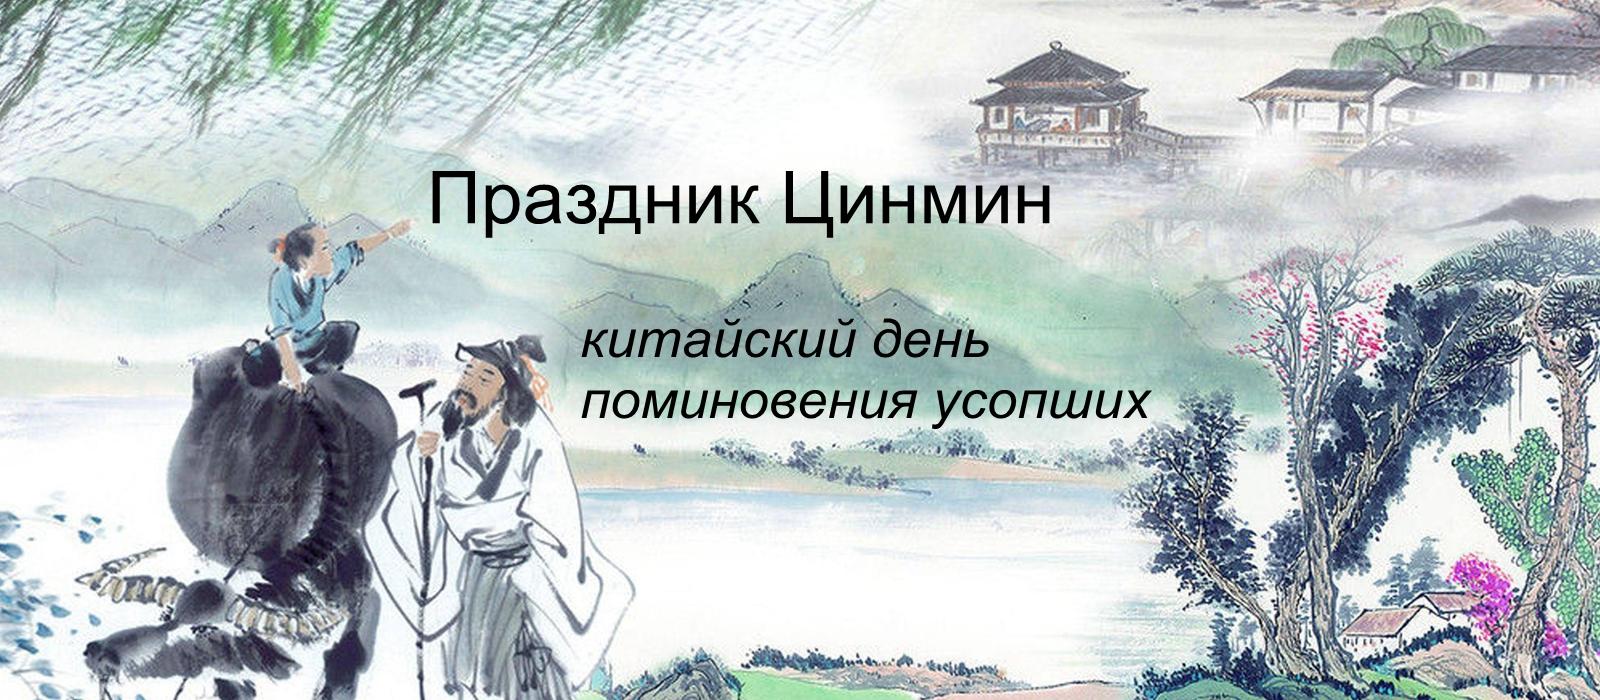 Праздник Цинмин